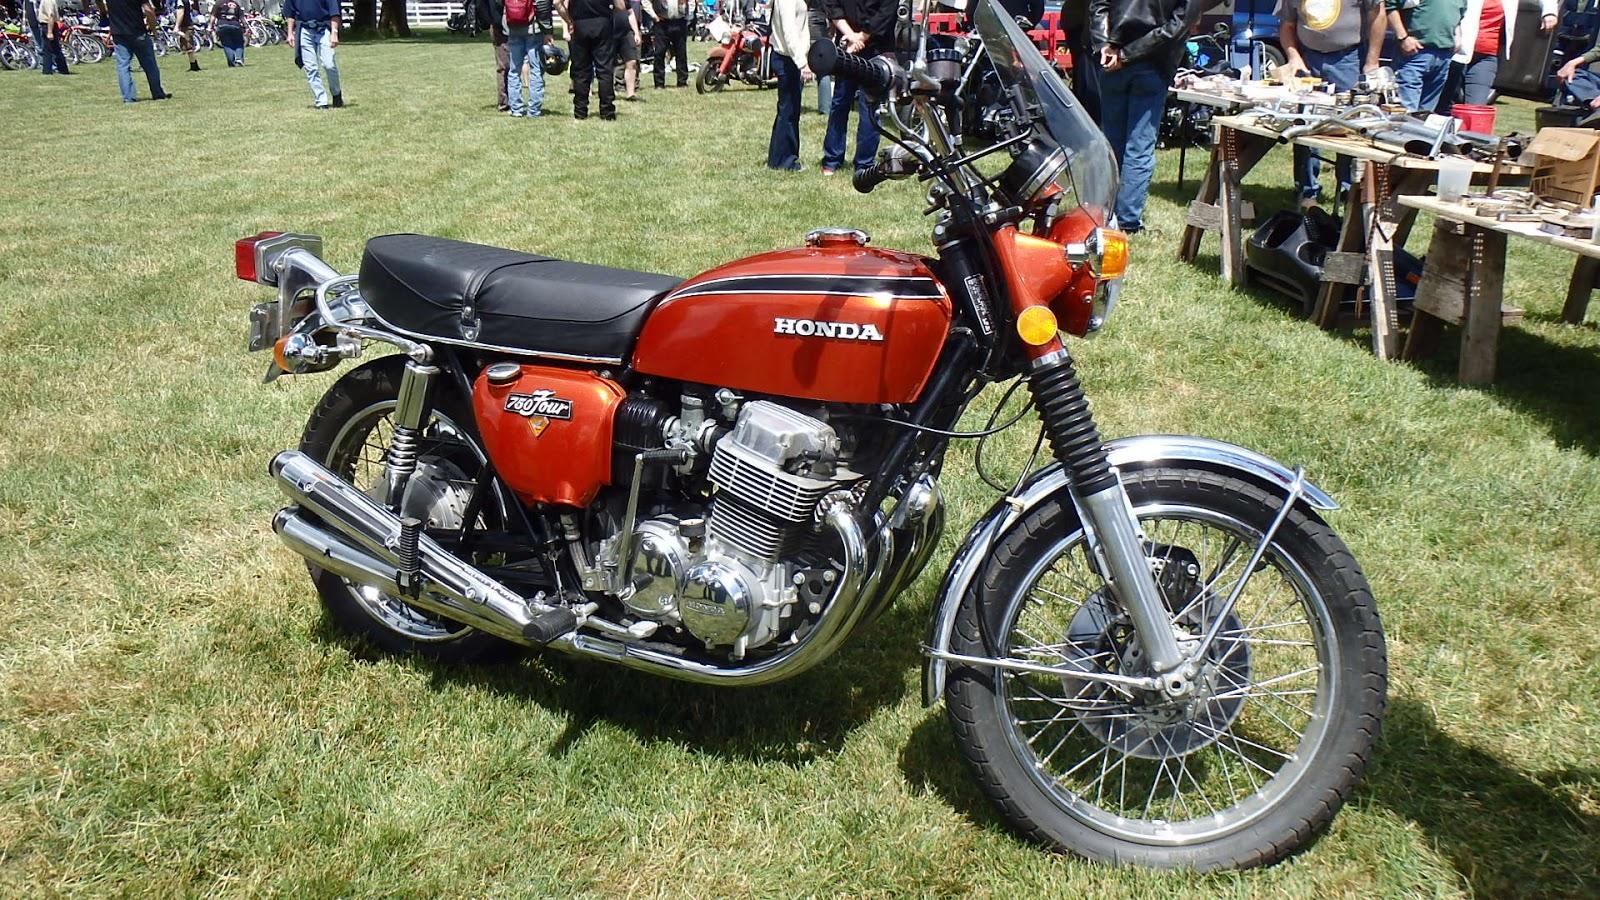 trobairitz' tablet: 2013 oregon vintage motorcycle show